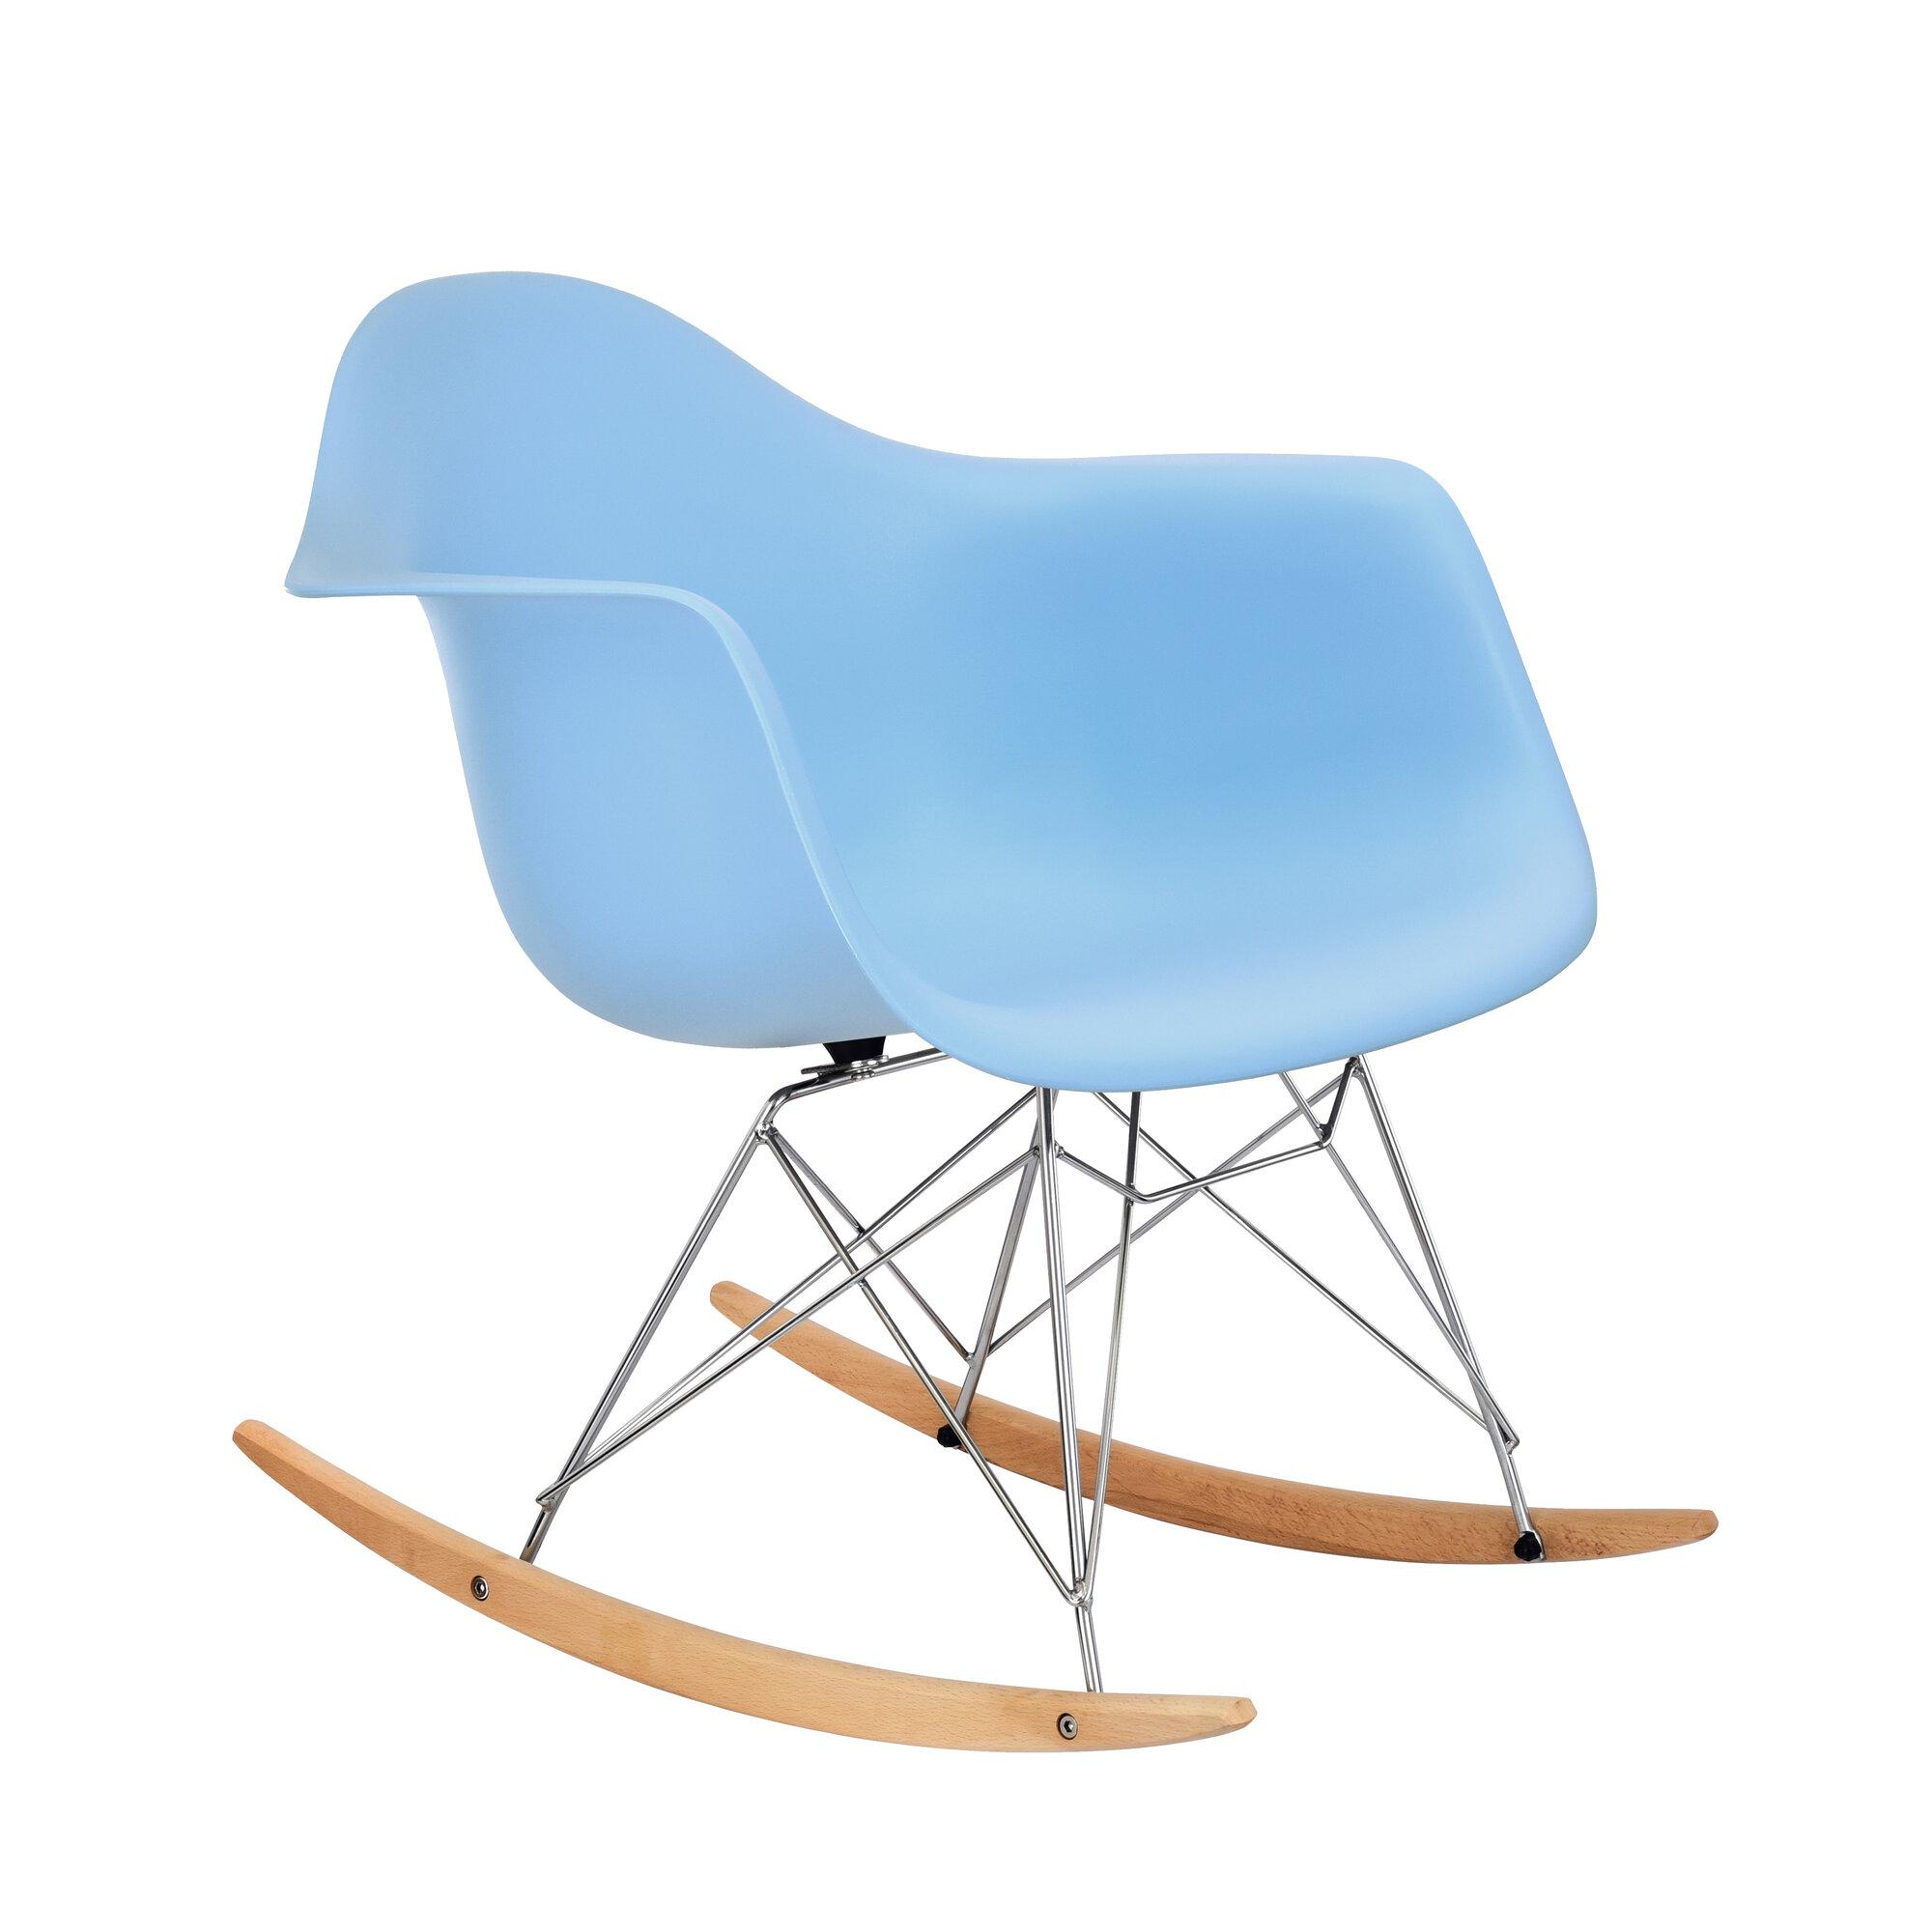 bench chair vintage sofa mid listings armchair century vinterior fantastic rocking ercol